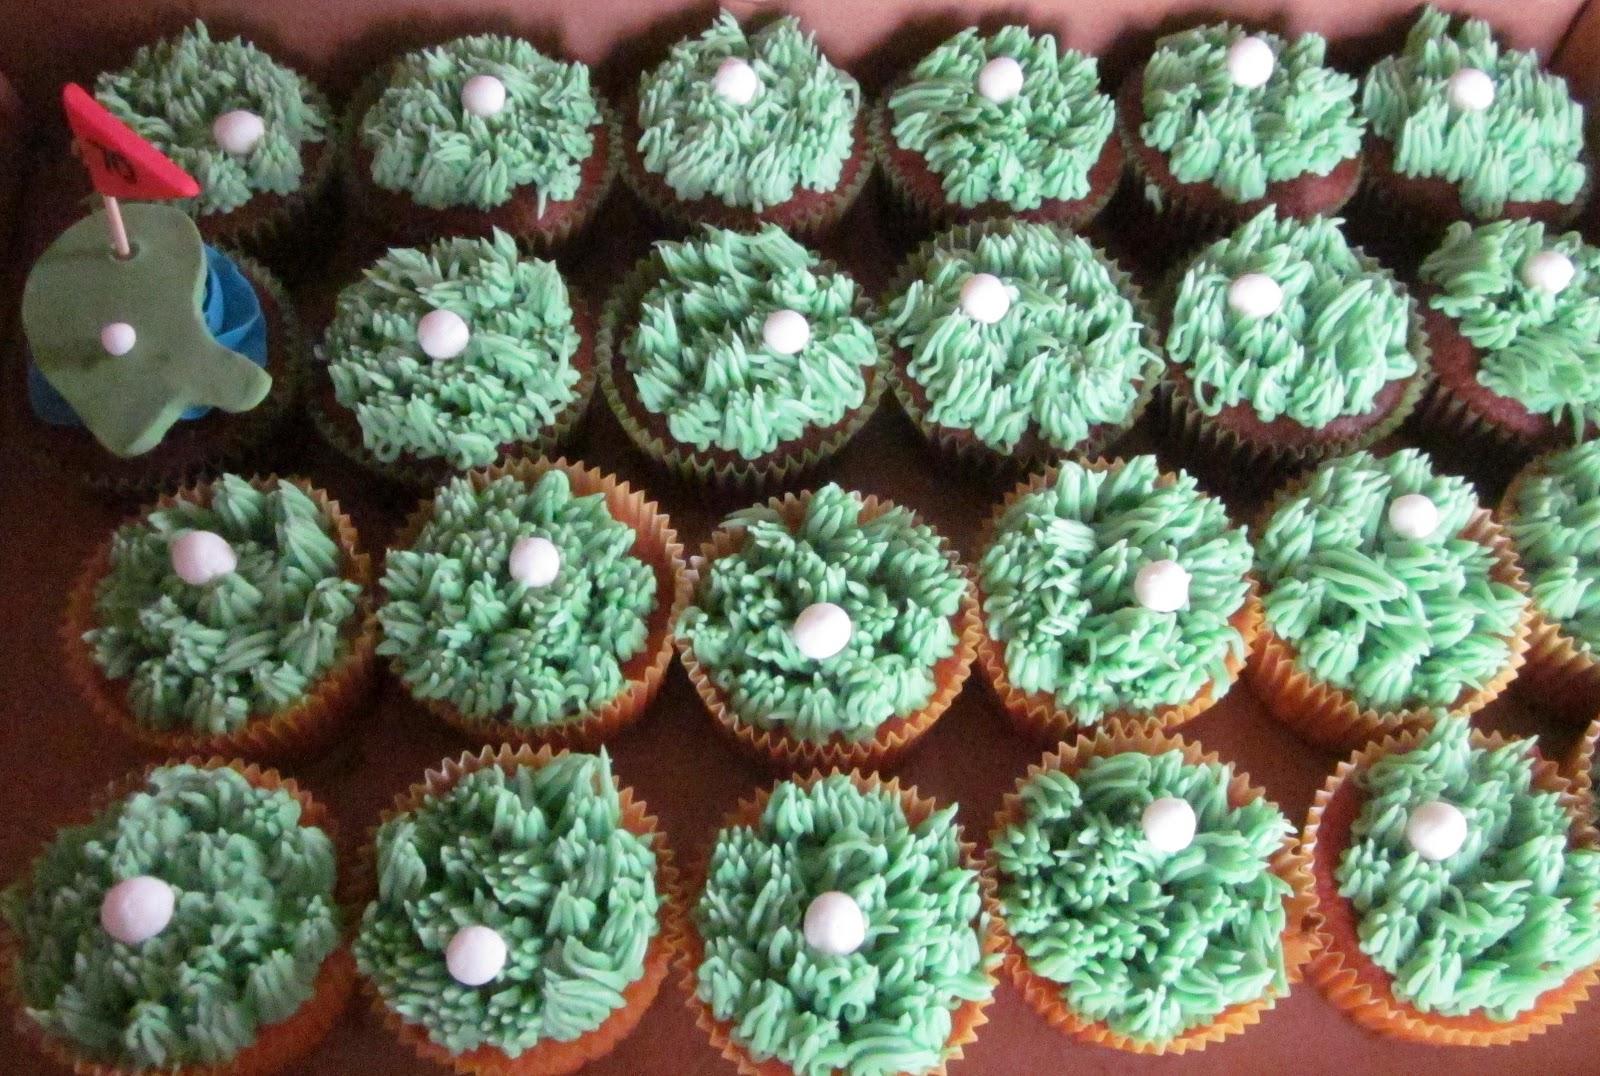 Second Generation Cake Design: Golf Themed Birthday regarding Cupcake Birthday Display